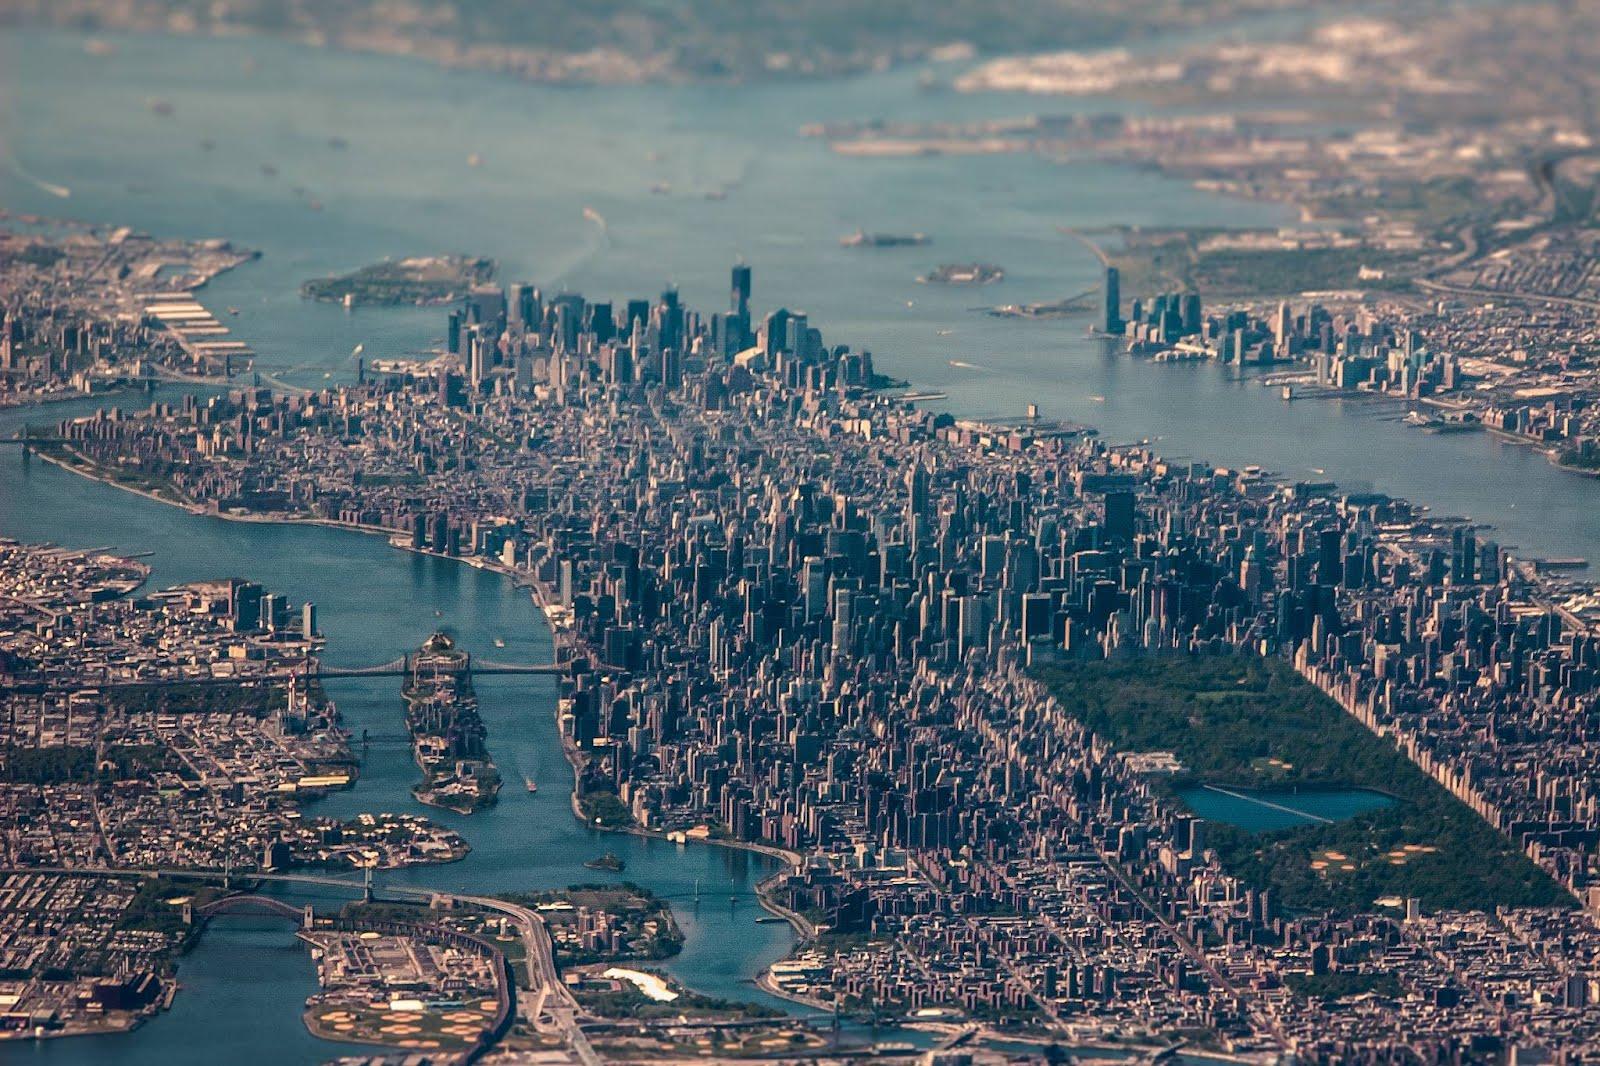 Невероятно фото Нью-Йорка (аэрофотосъемка)